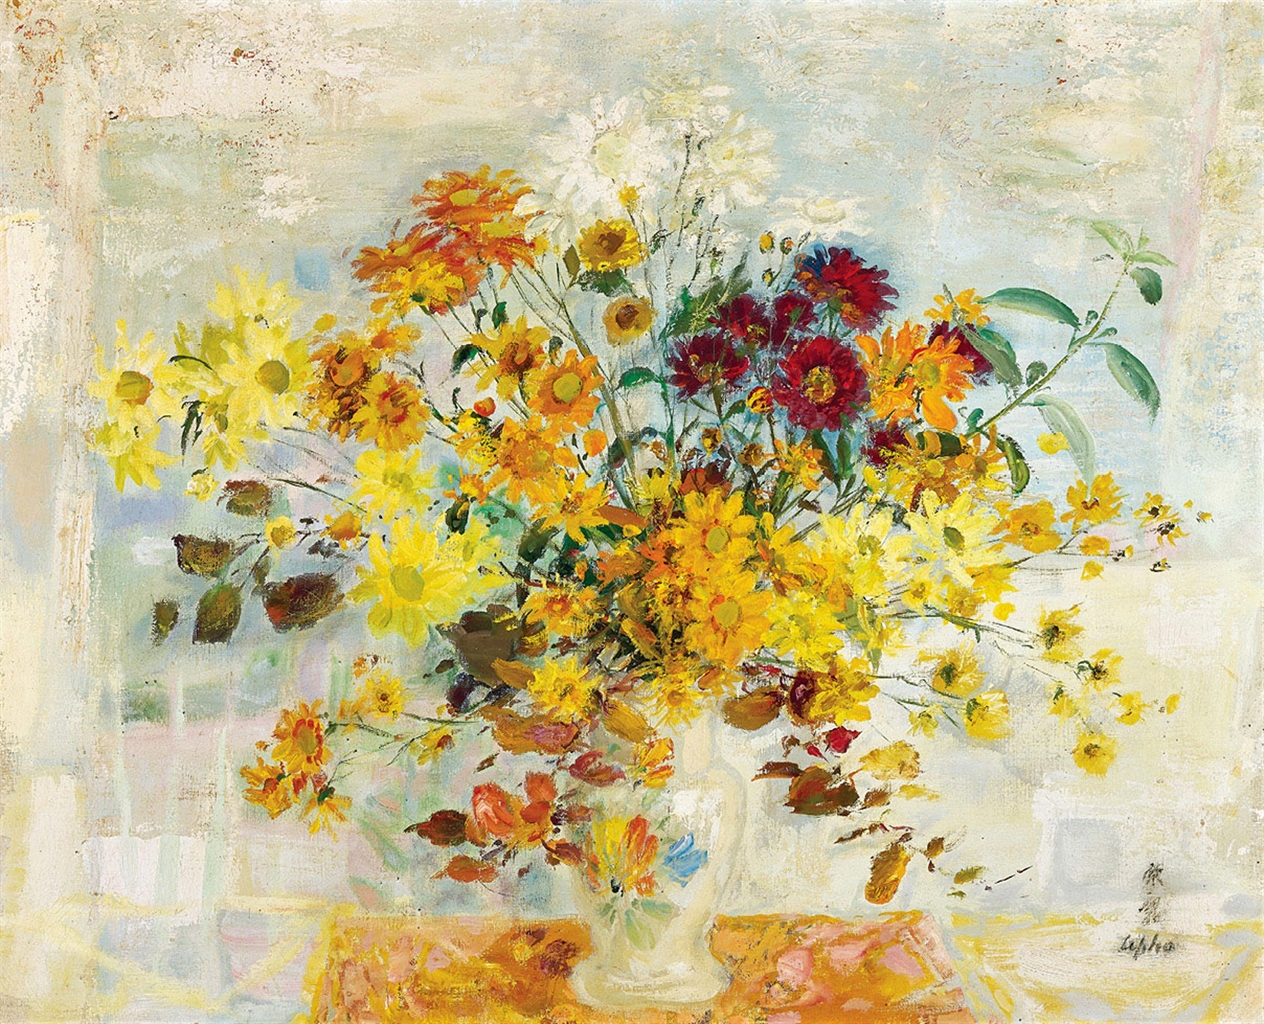 Le Pho-Chrysanthemum Still Life-1970